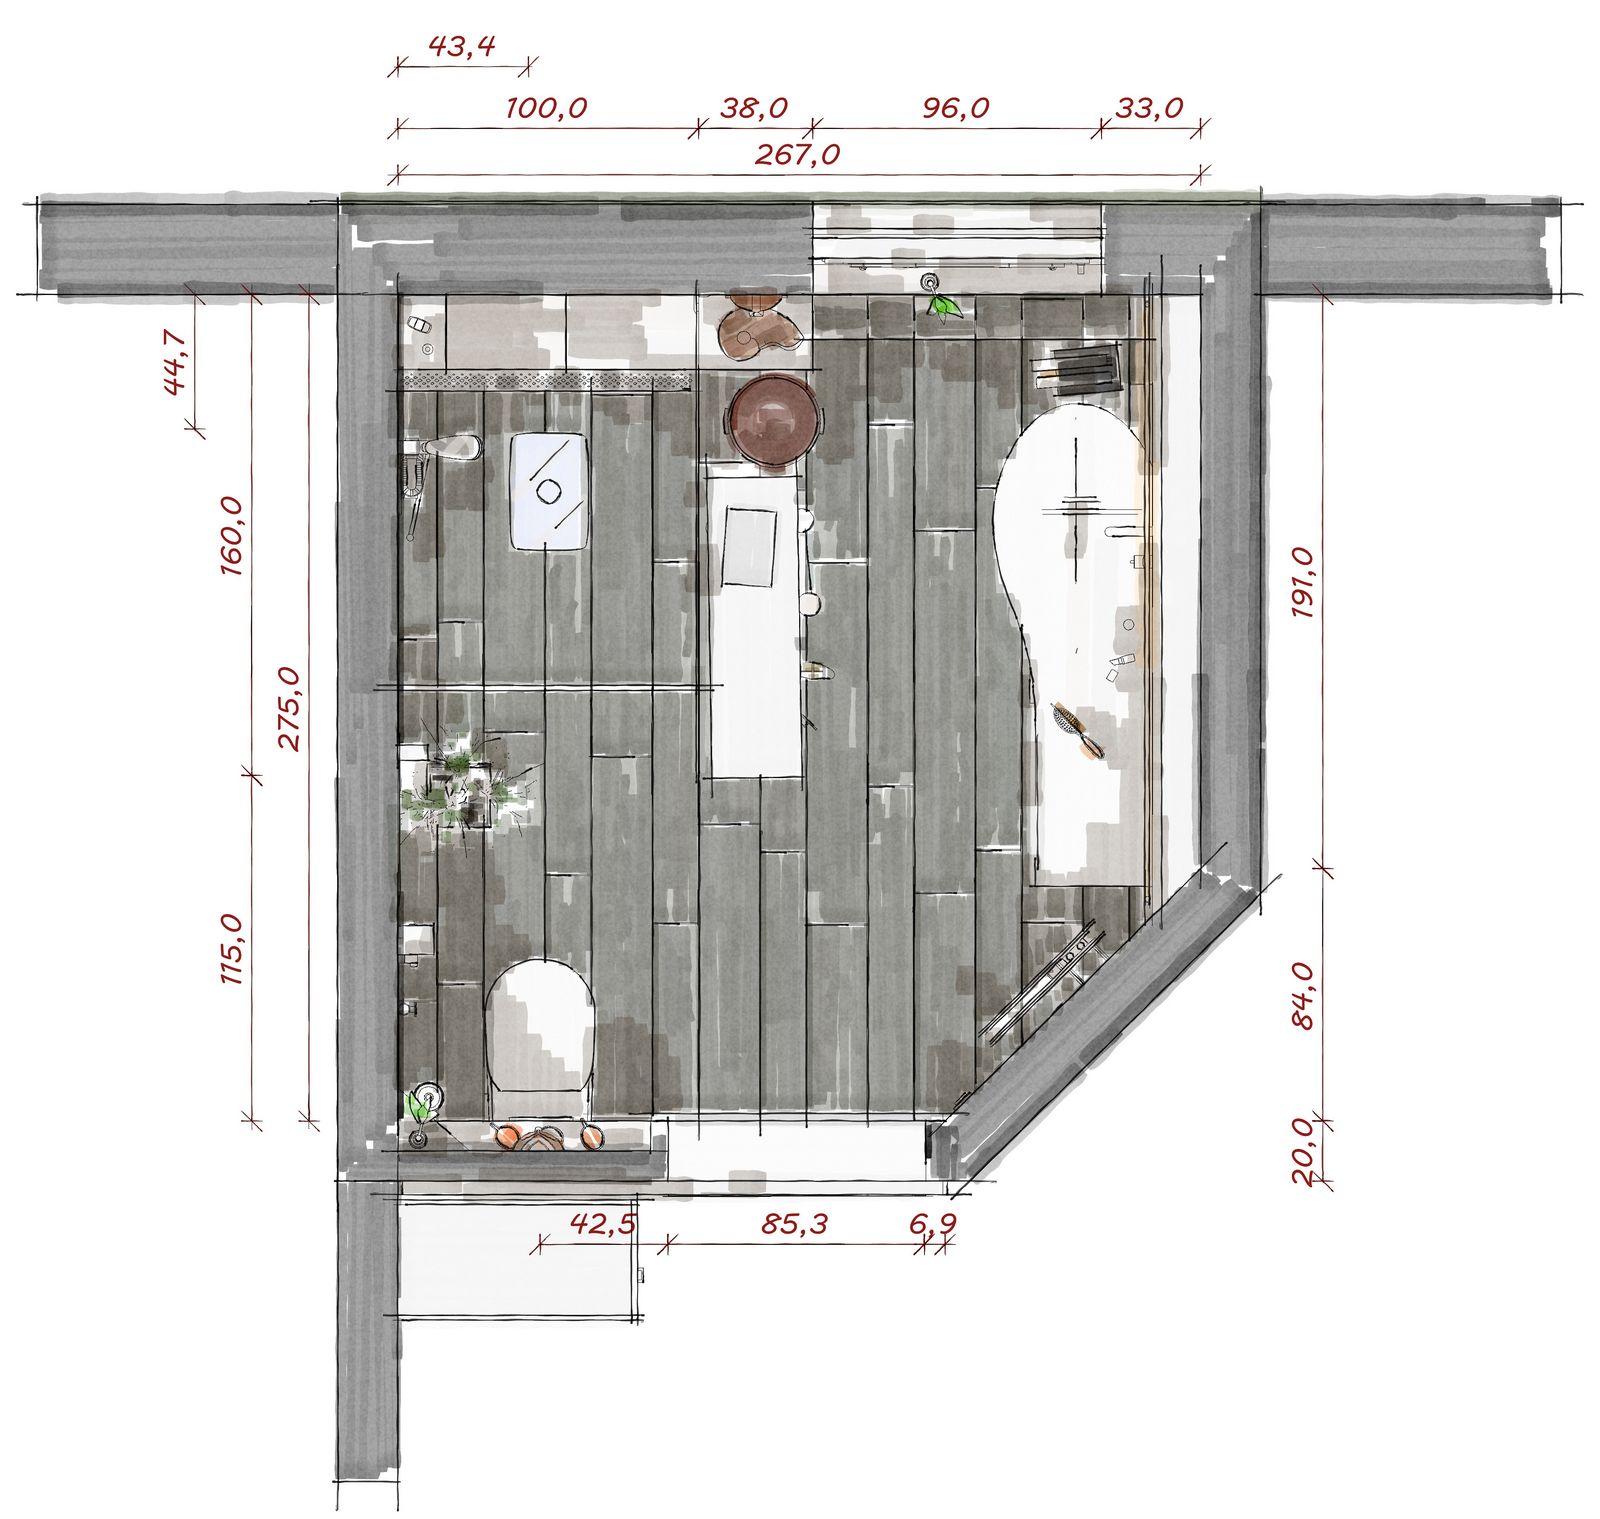 Planungsbüro Wolkober: Bad, Umbau, Neubau, Hausbau, Renovierung ...